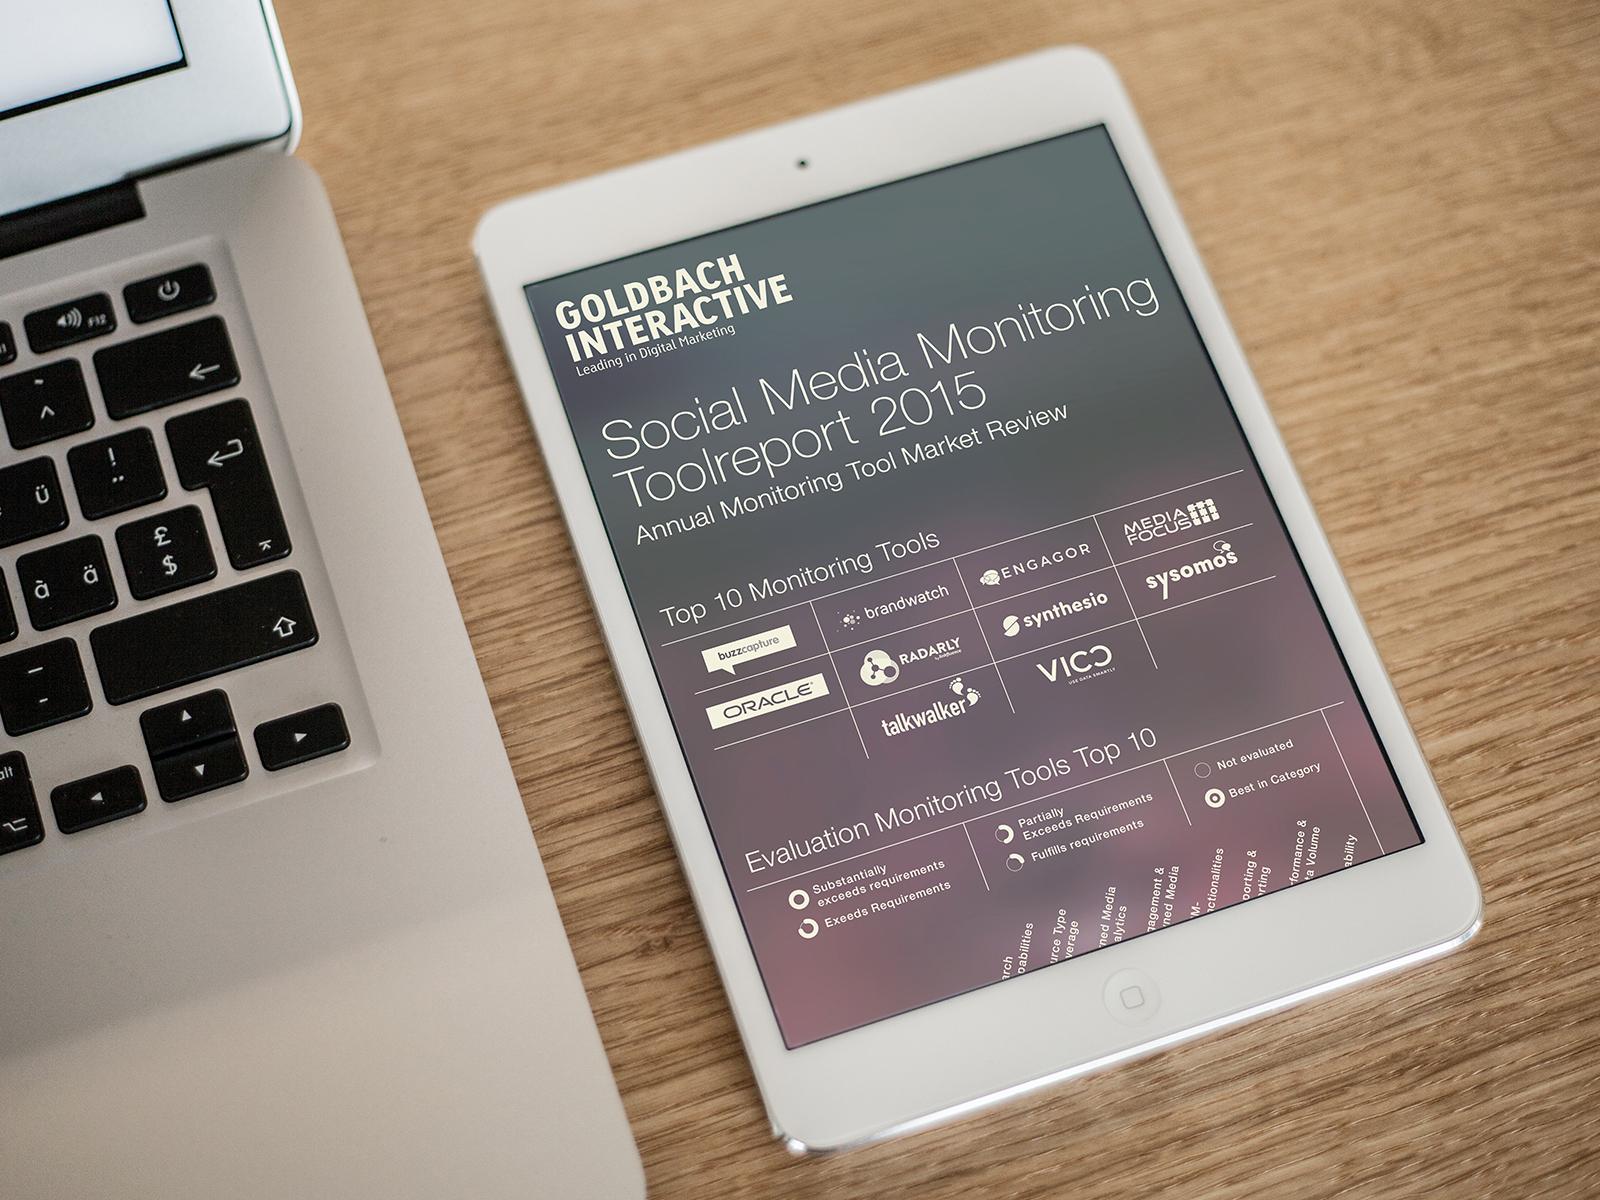 Social Media Monitoring Tool Report